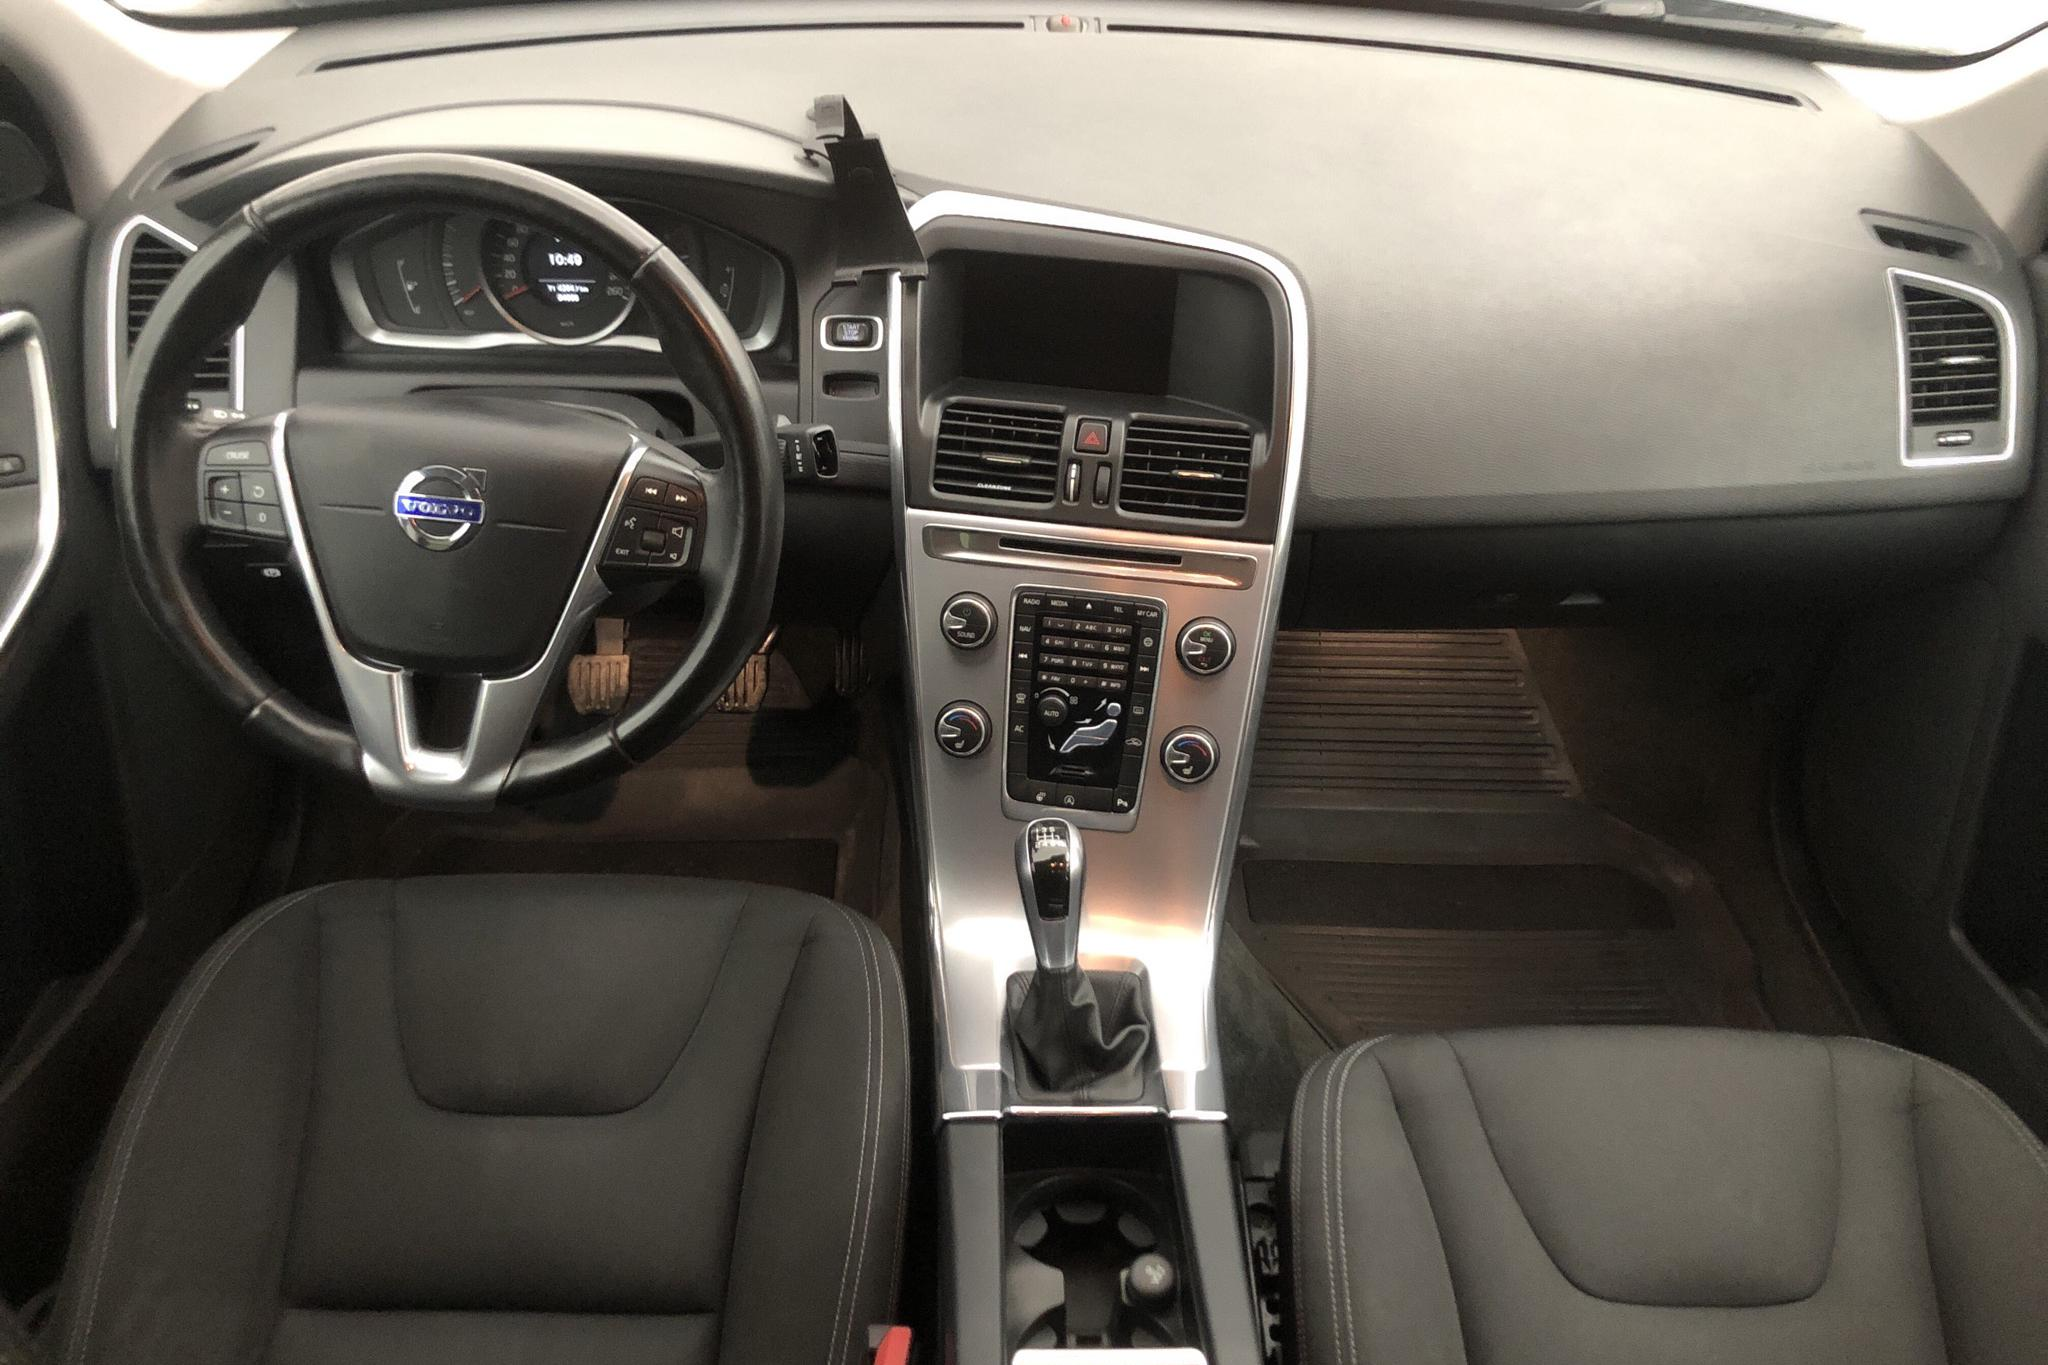 Volvo XC60 D3 2WD (150hk) - 84 900 km - Manual - gray - 2017